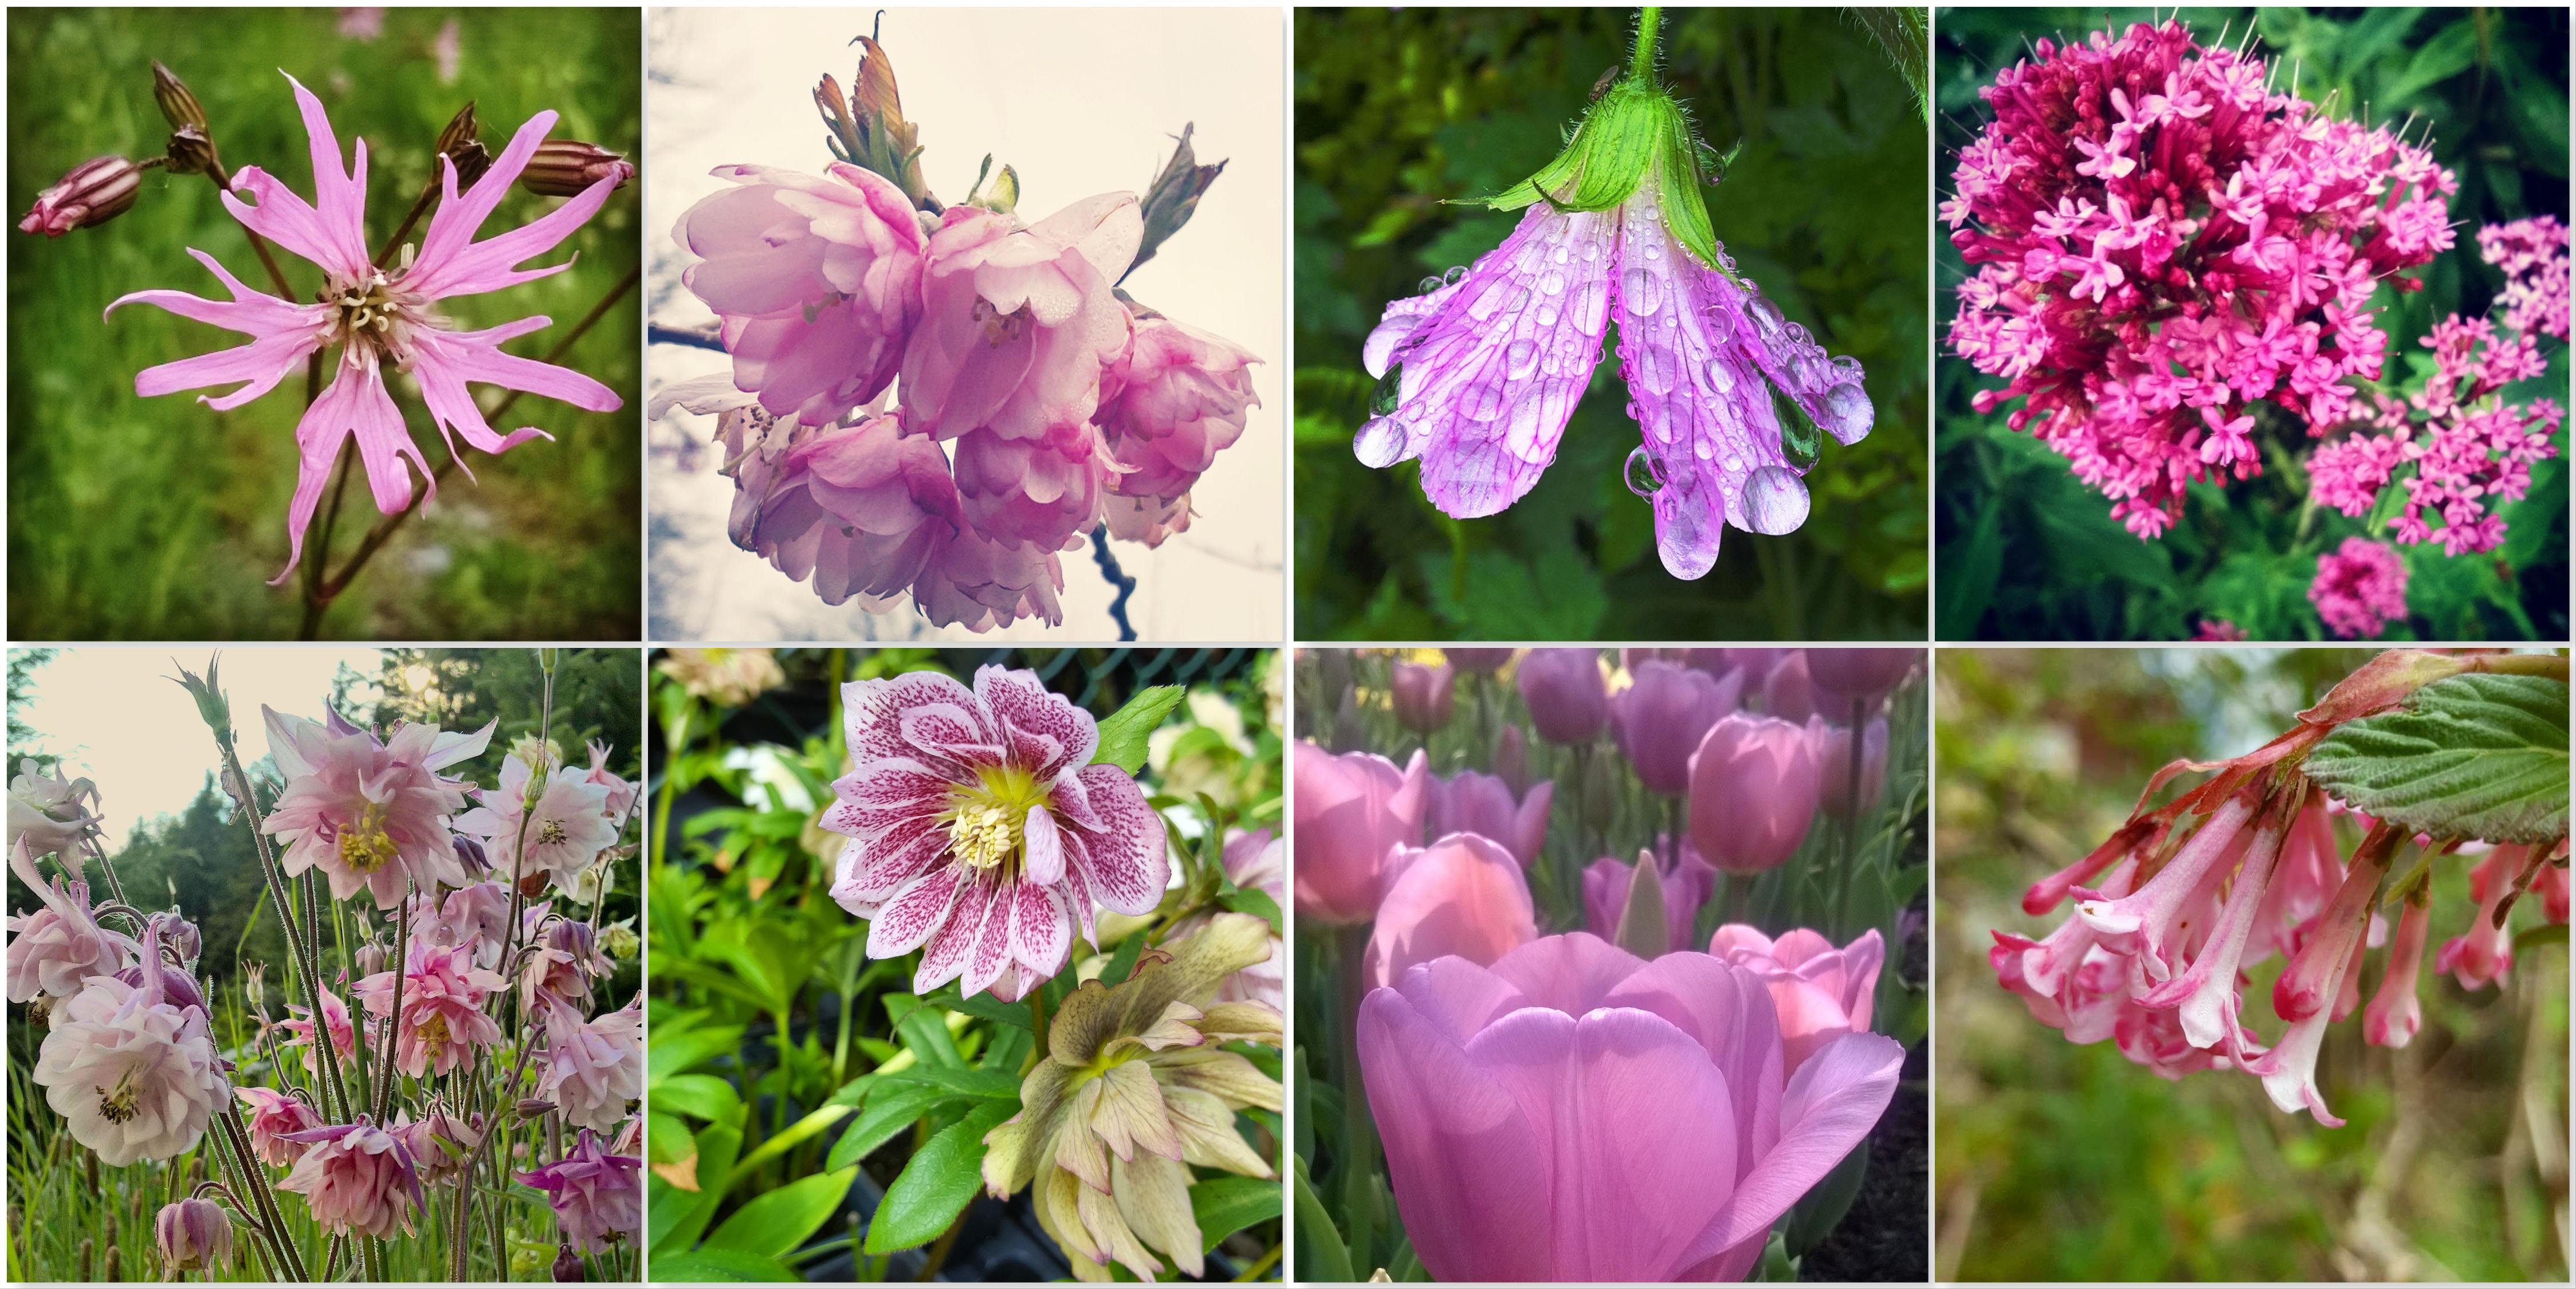 Ragged Robin - Blossom - Mallow - Valerian - Aquilegia - Hellebore - Tulip - Virbunum Bodnantense Dawn